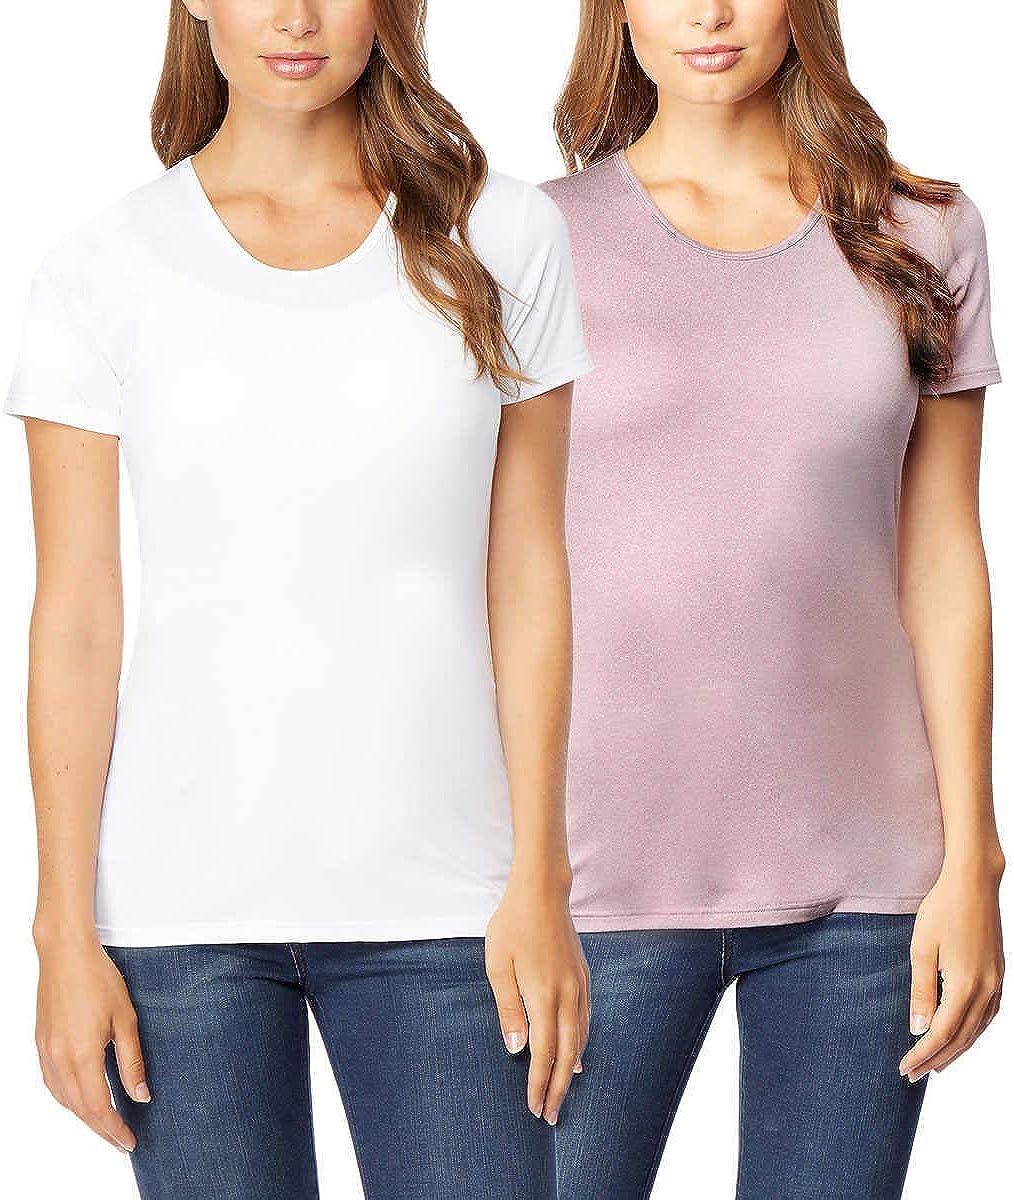 32 Ranking TOP1 DEGREES Women 2 Pack Cool Scoop Tee Shirt Atlanta Mall Wicking Neck